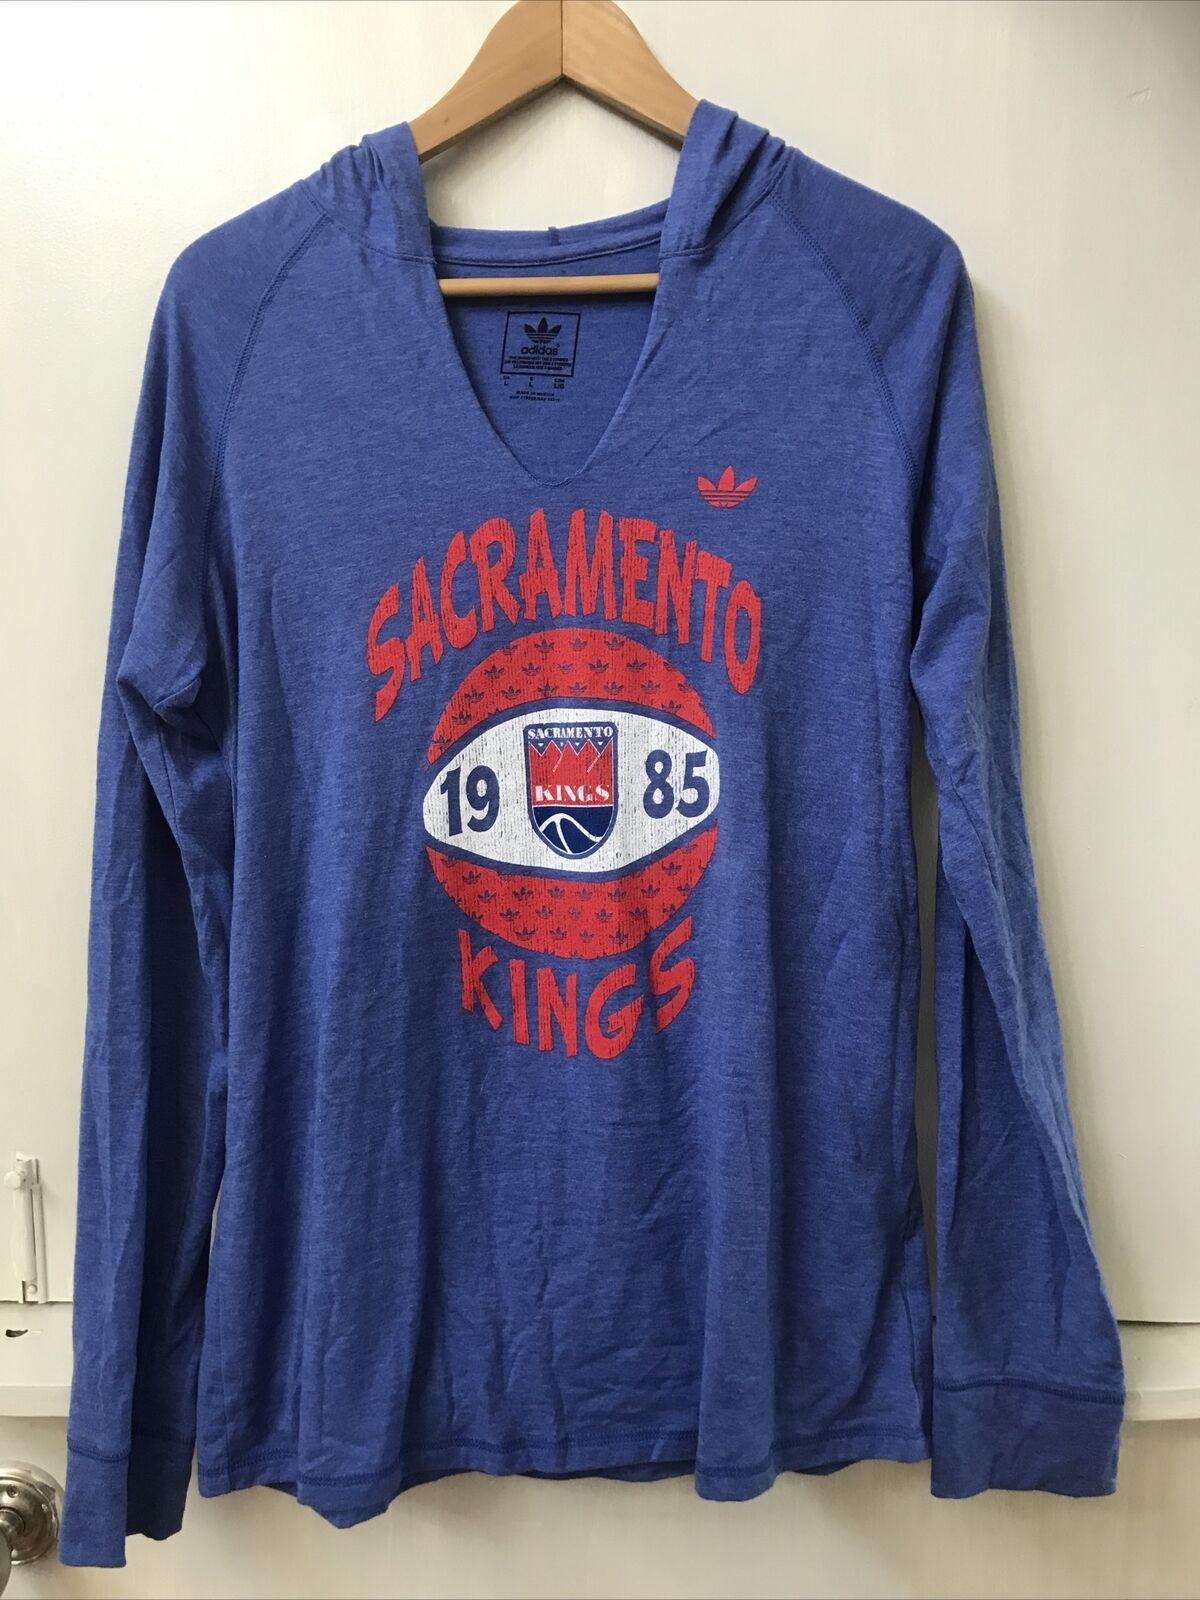 Adidas Trefoil Sacramento Kings Basketball NBA Blue Hooded Tee Top Size L